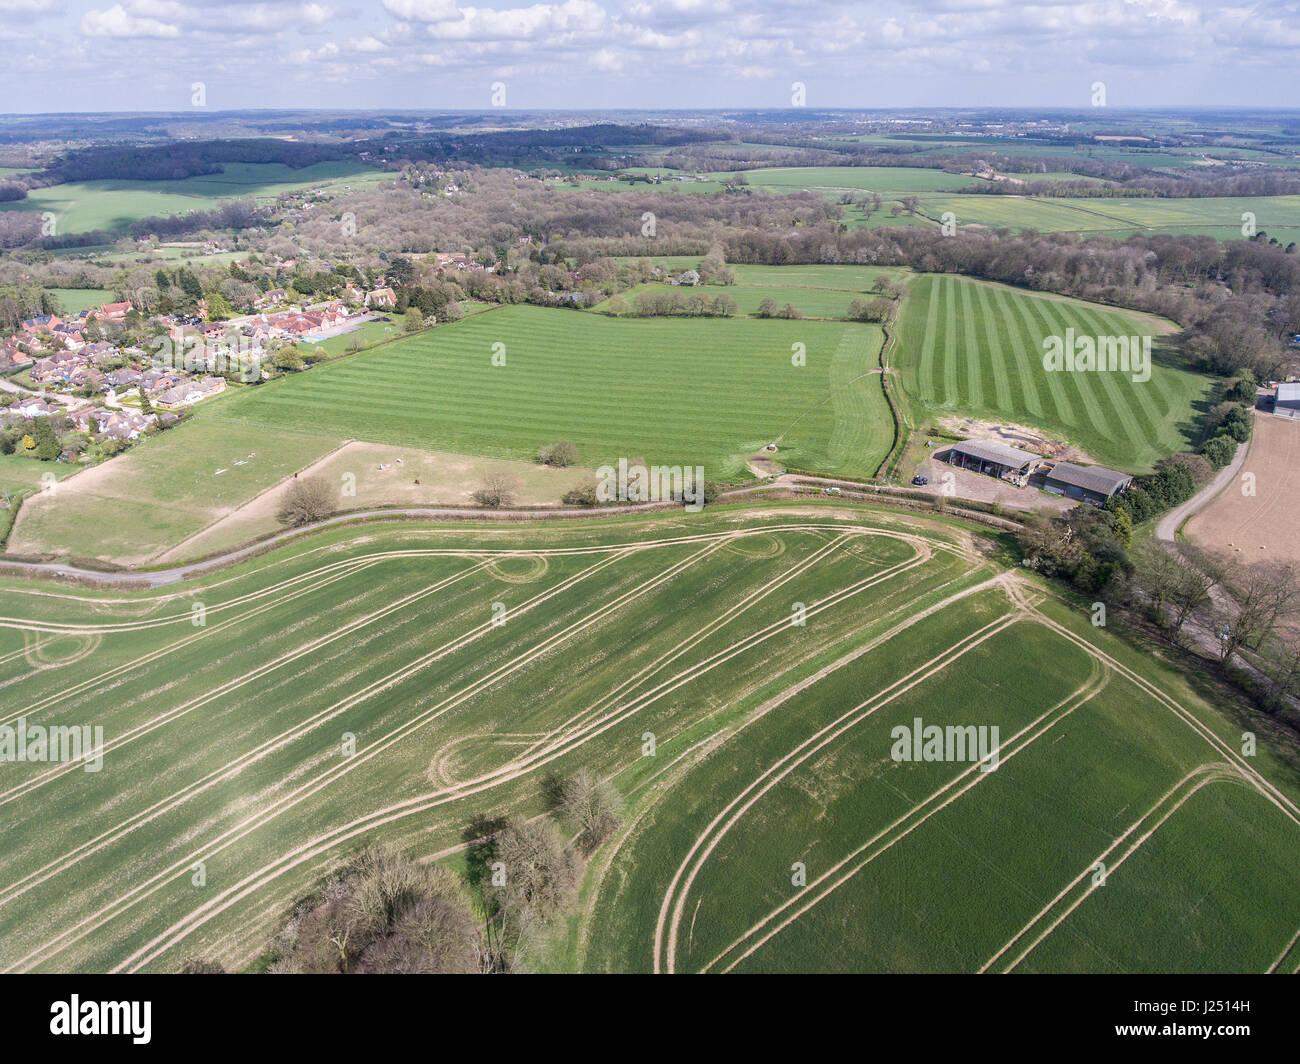 Aerial Photography UK Stock Photo